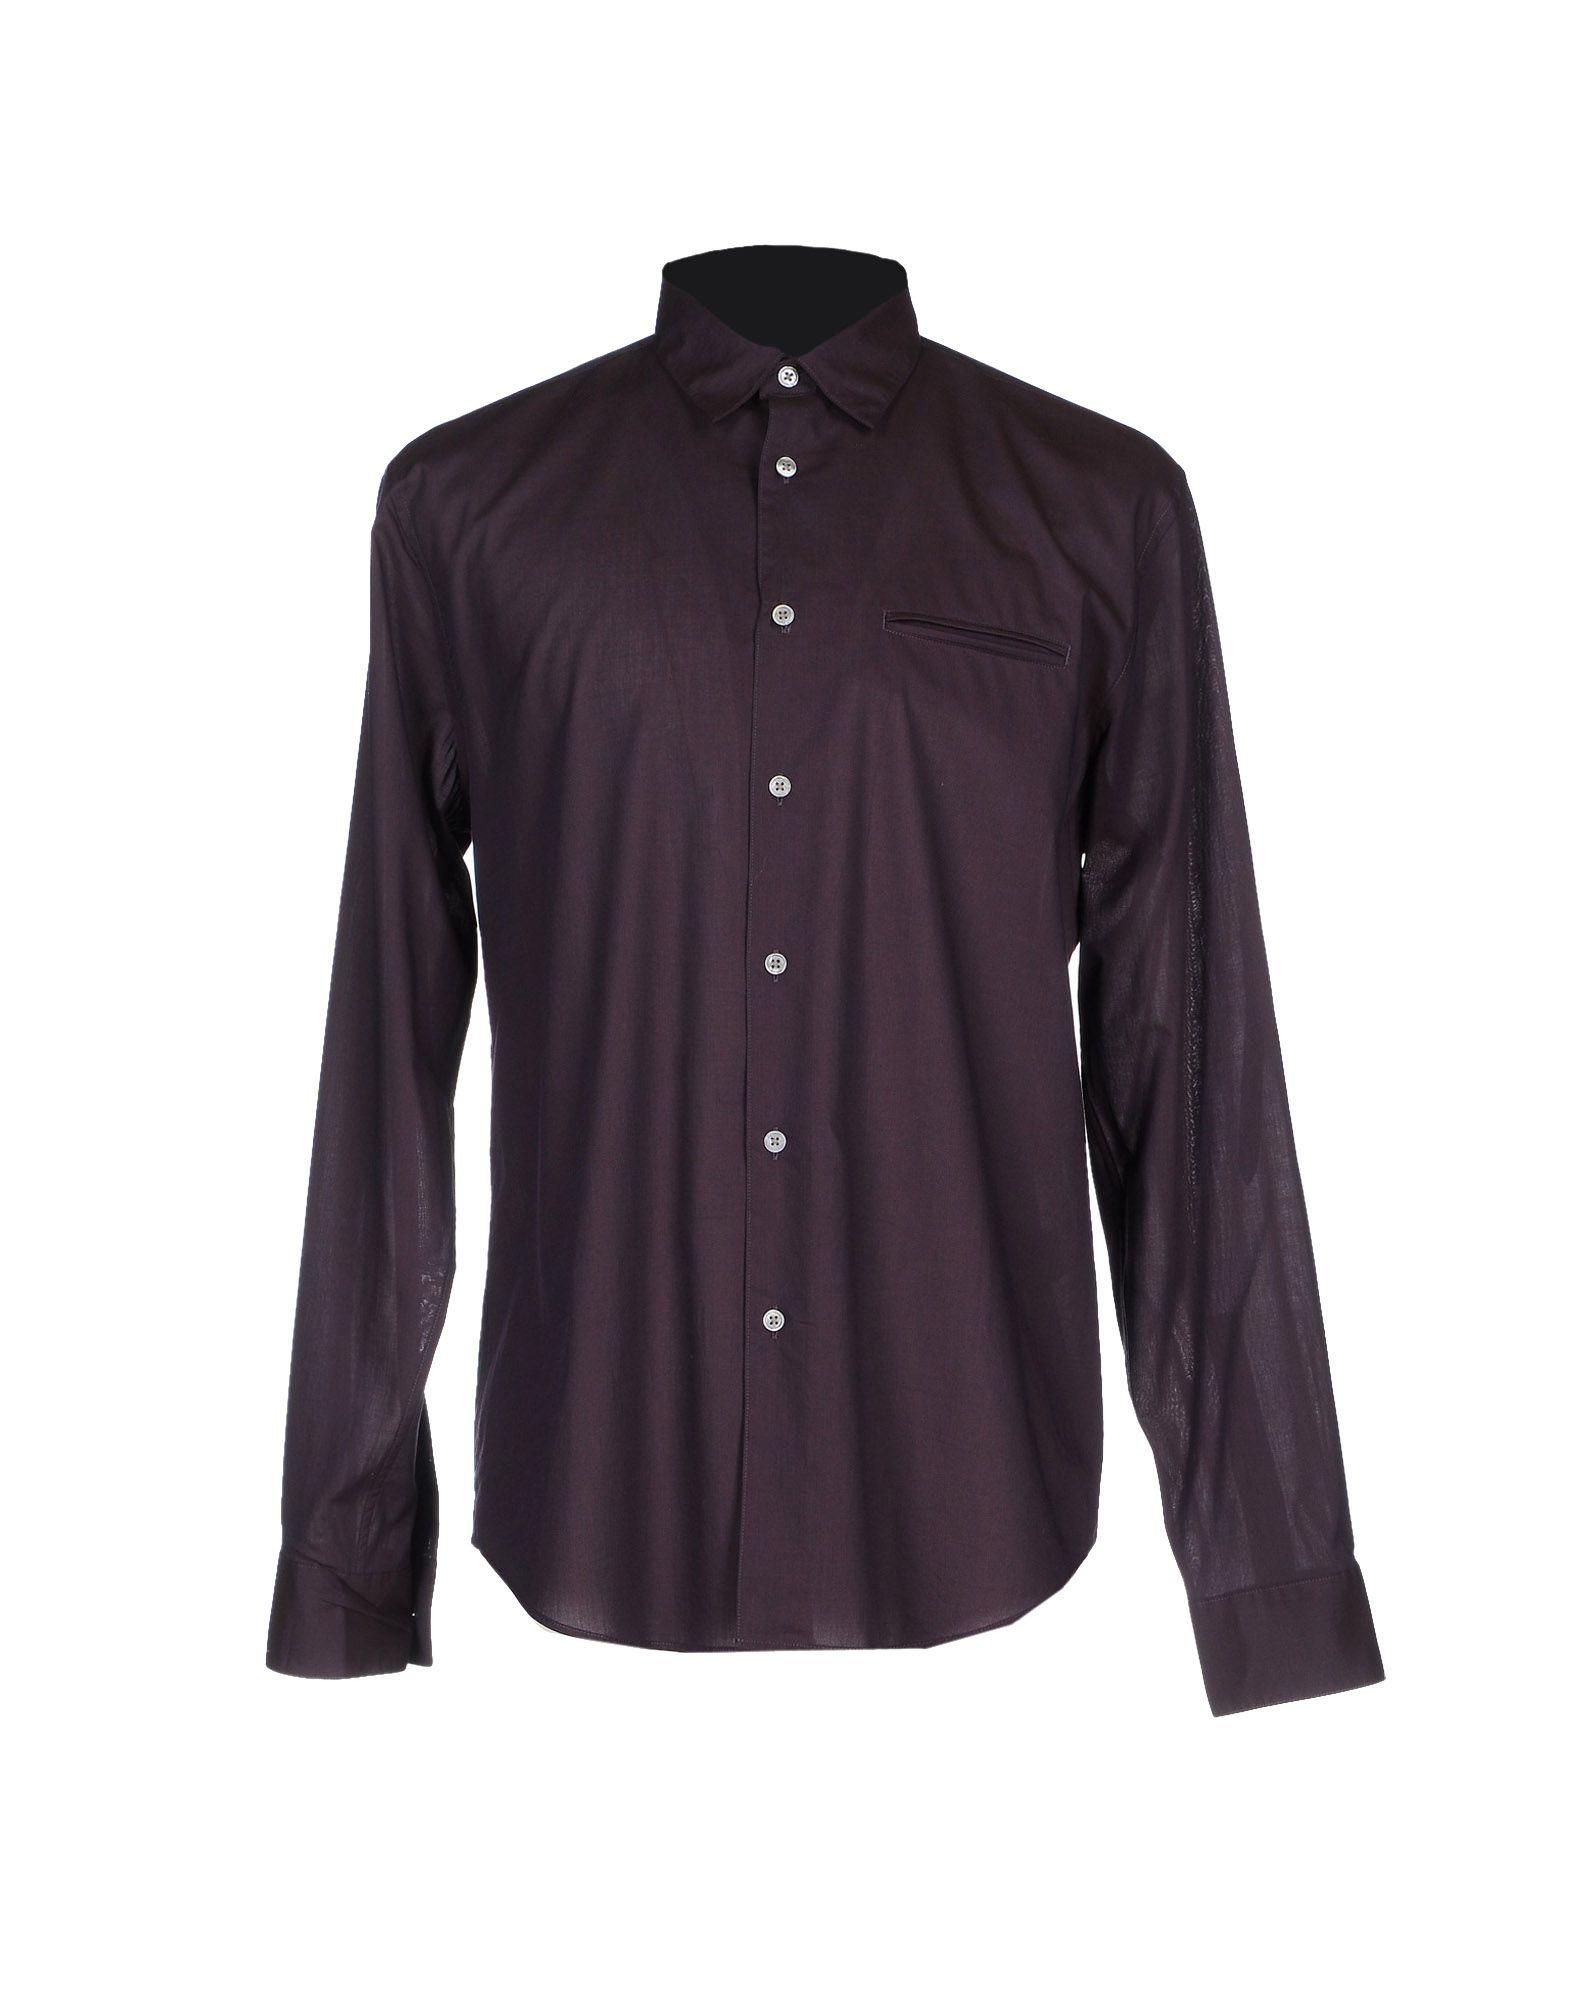 John varvatos Shirt in Black for Men (Dark purple) | Lyst